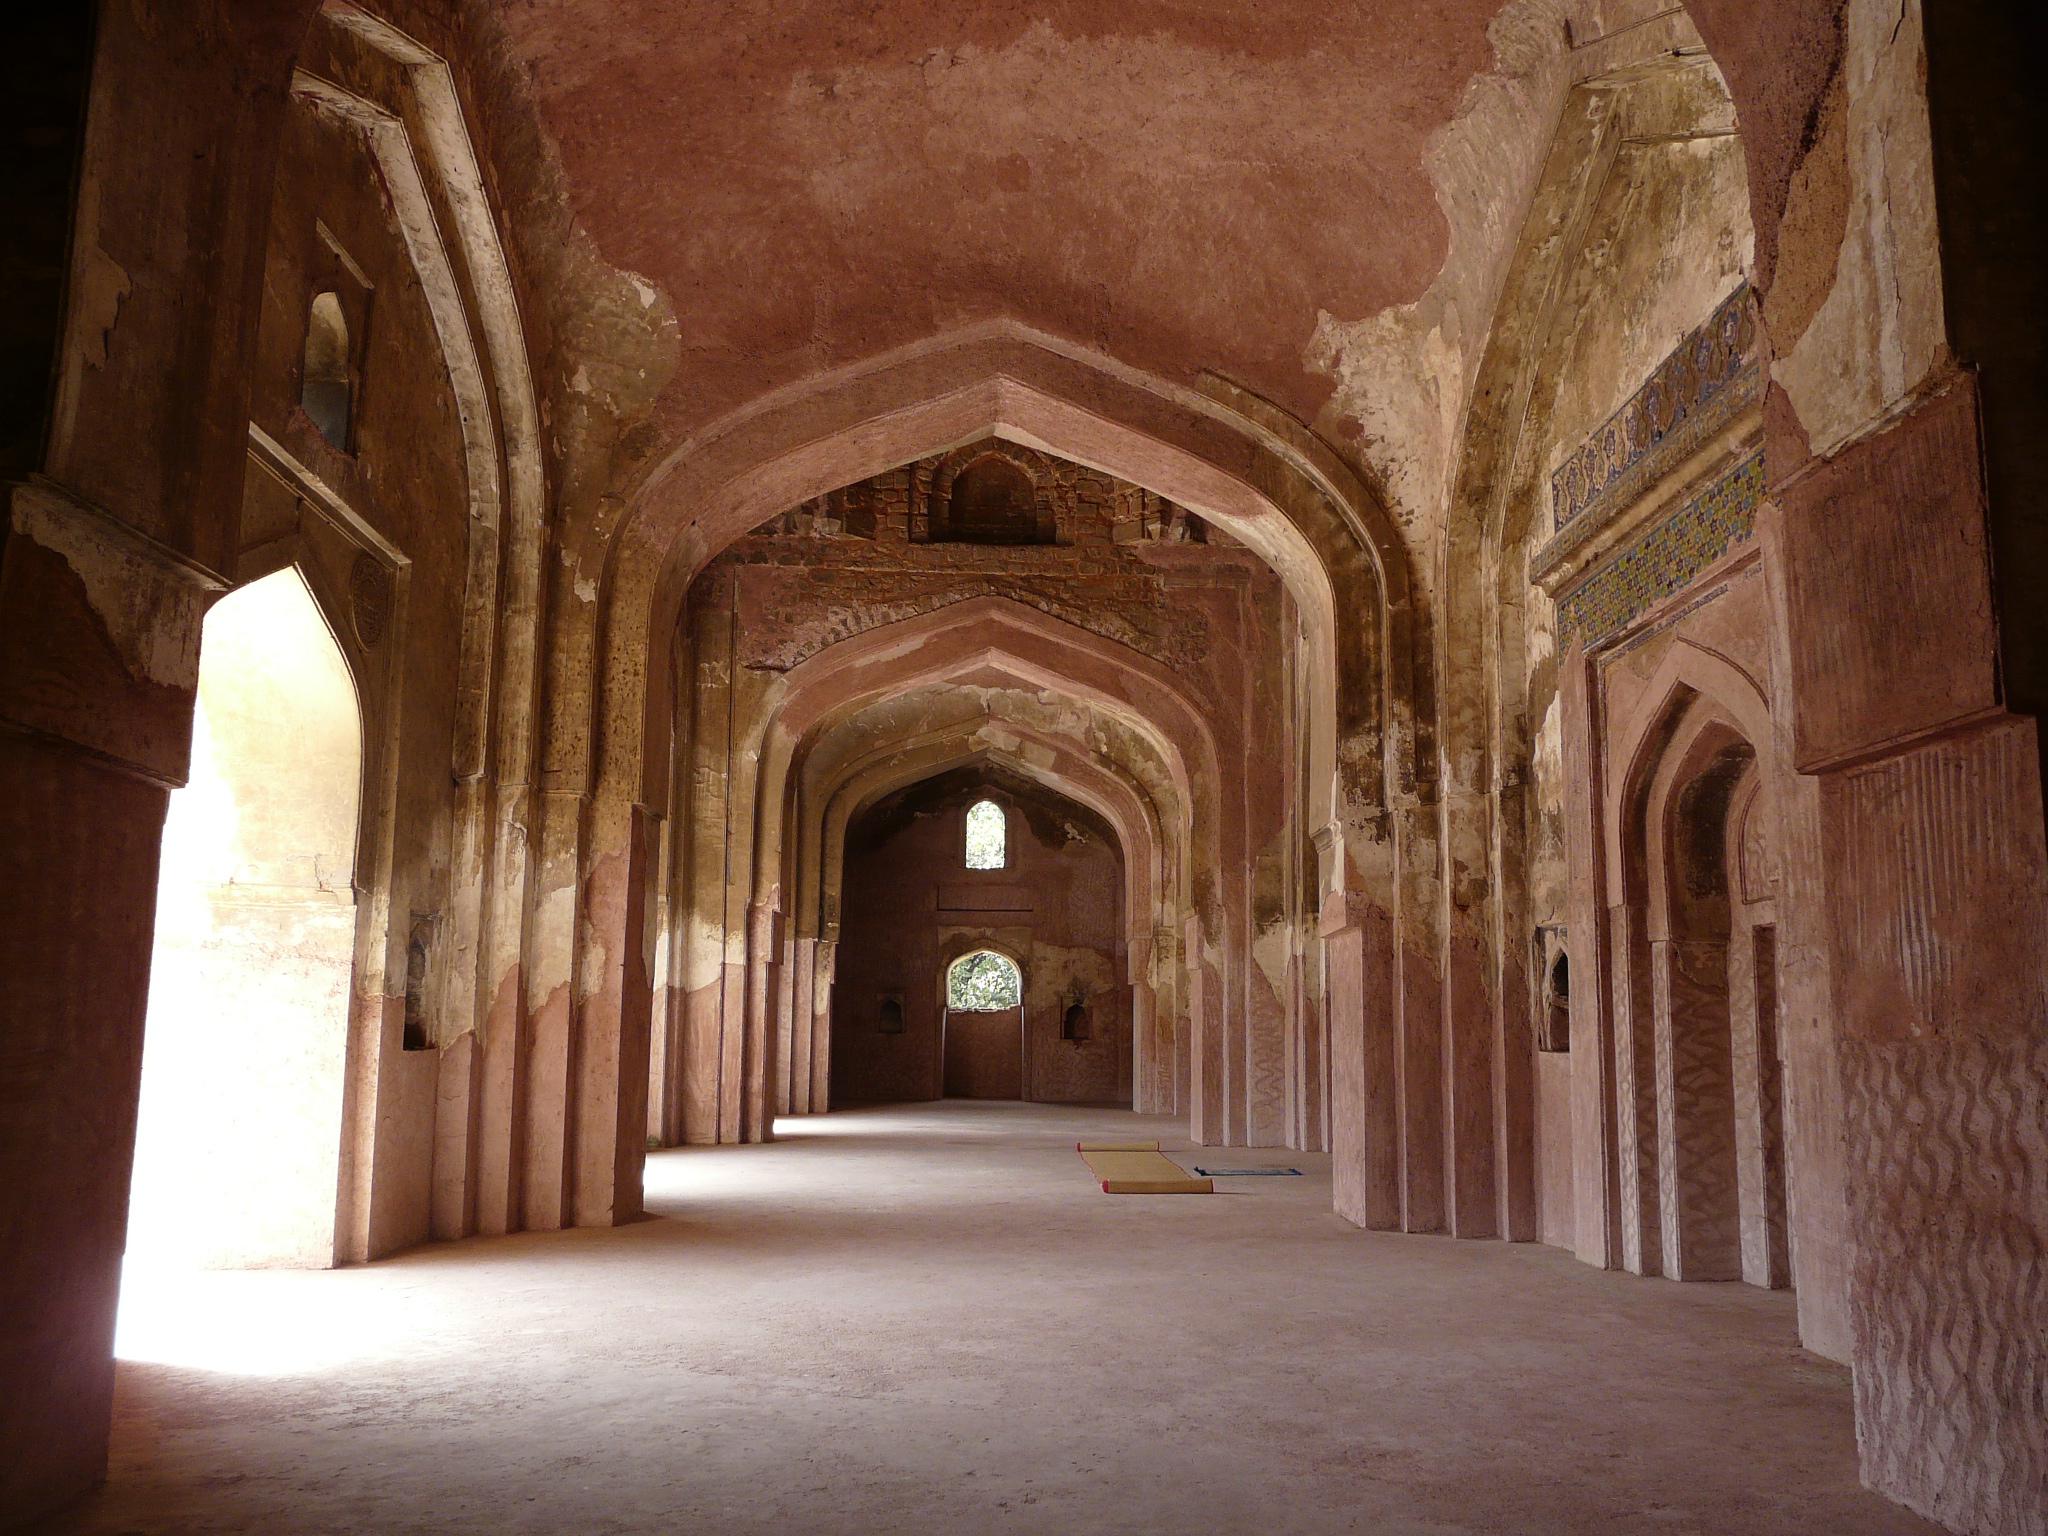 Taj Mahal Hd Wallpaper File Khairul Manazil Interior Opposite Purana Qila Delhi